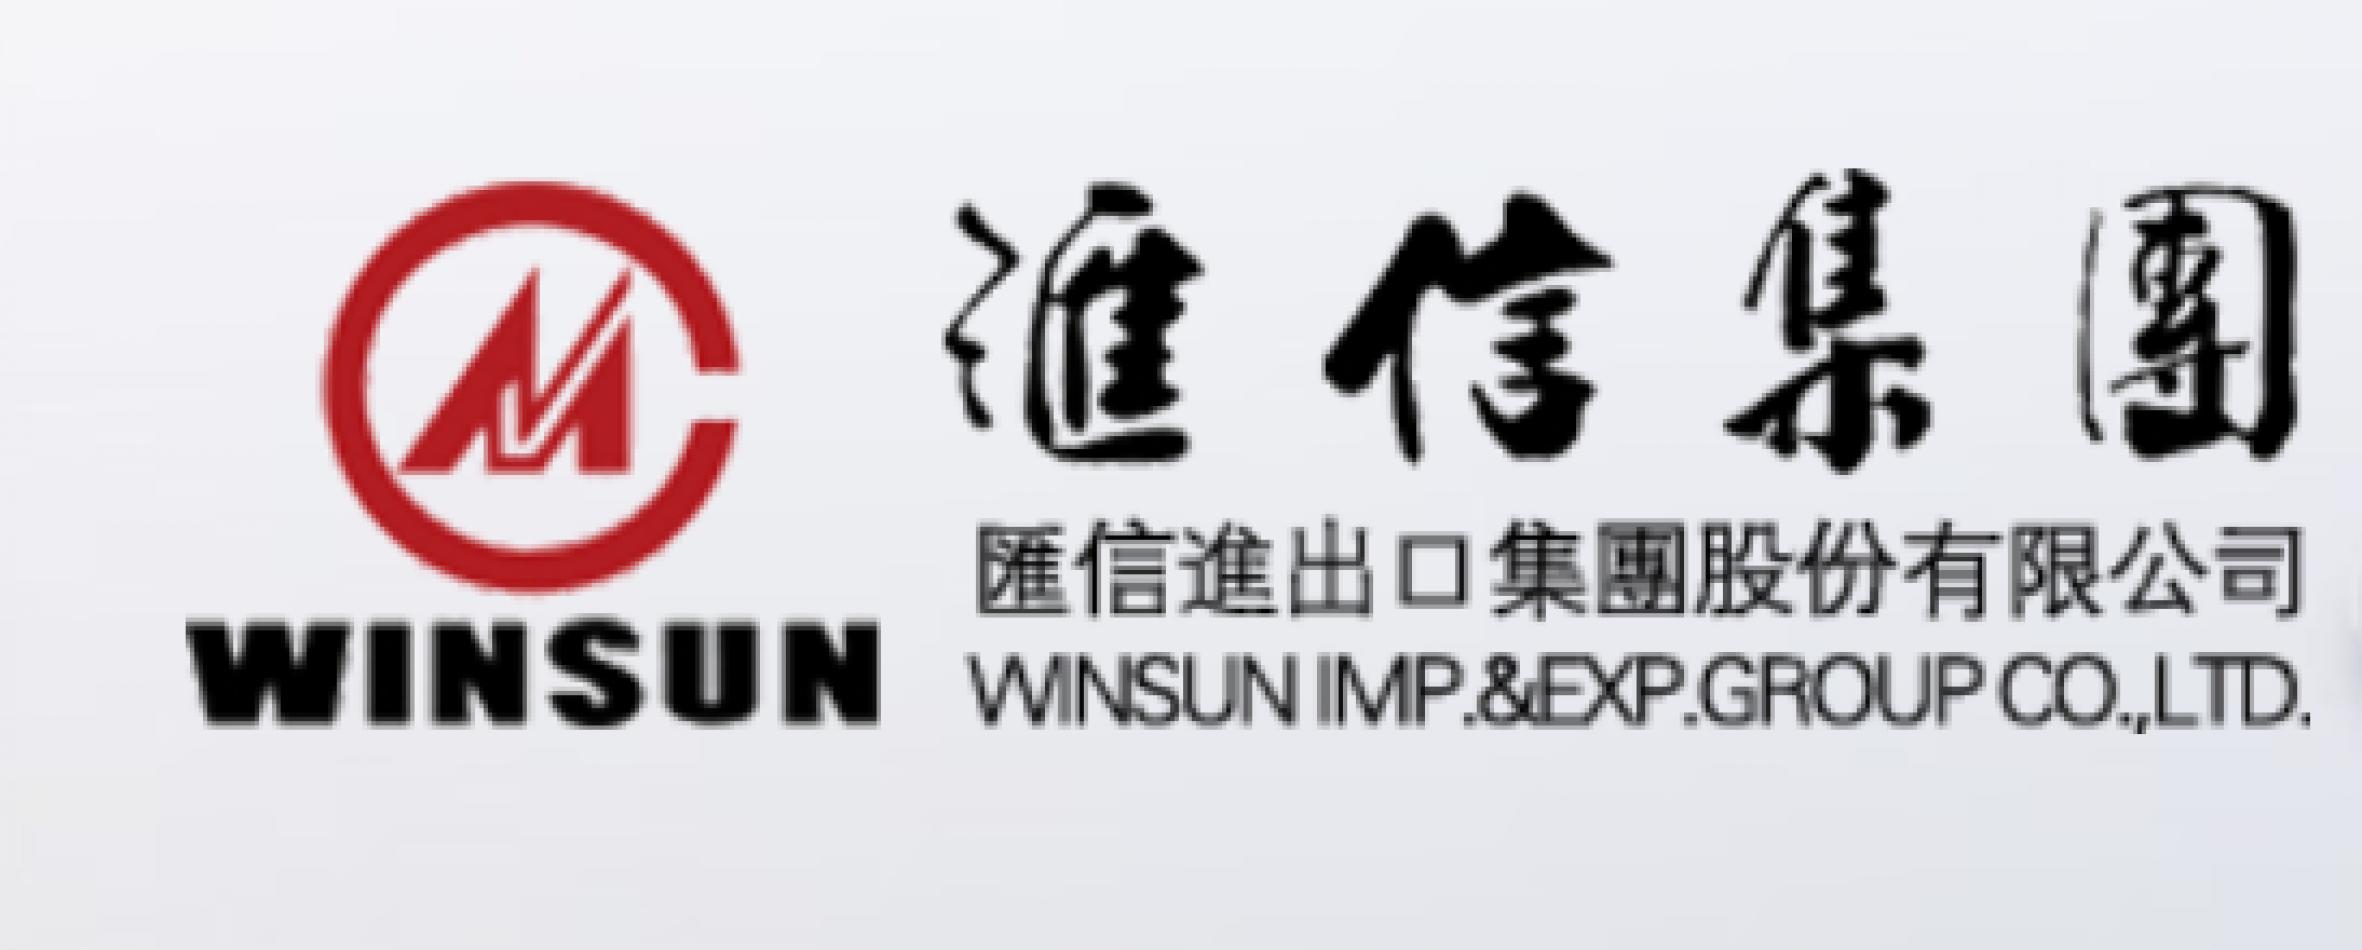 WINSUN IMP. & EXP. GROUP  CO., LTD.